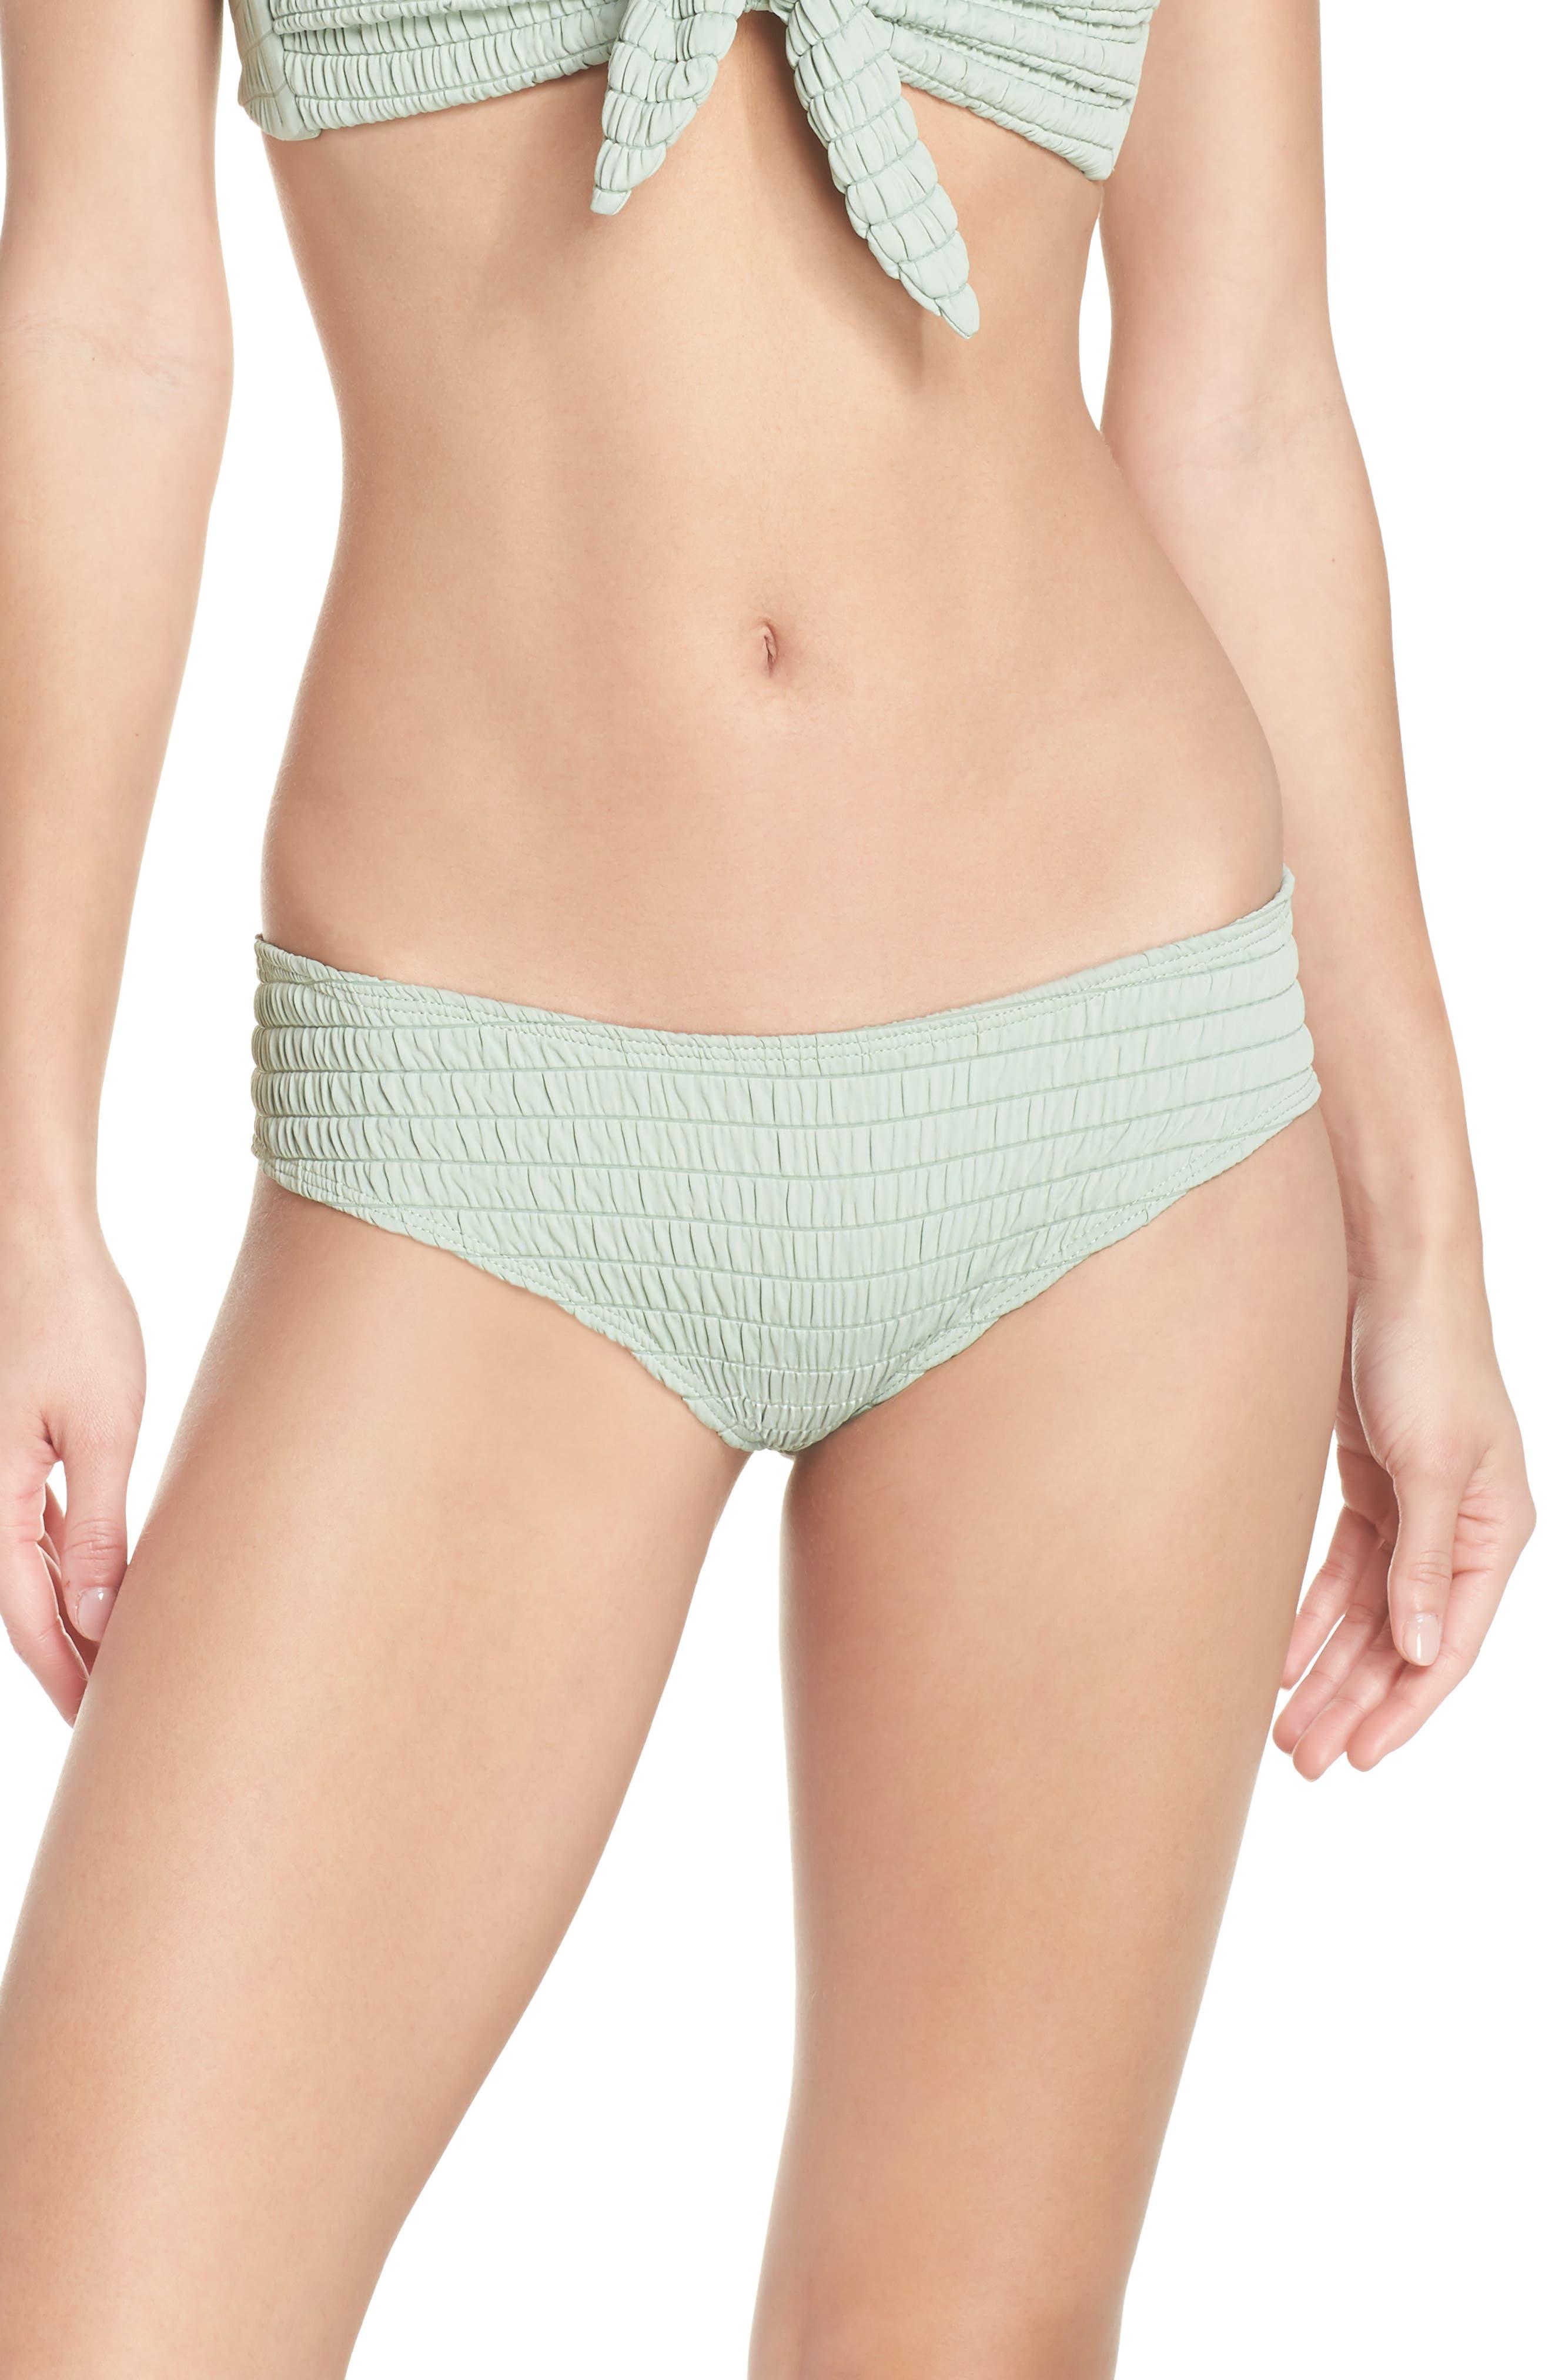 AC Nu Micro Bikini Bottoms,                         Main,                         color, PISTACHE SCRUNCH GREEN